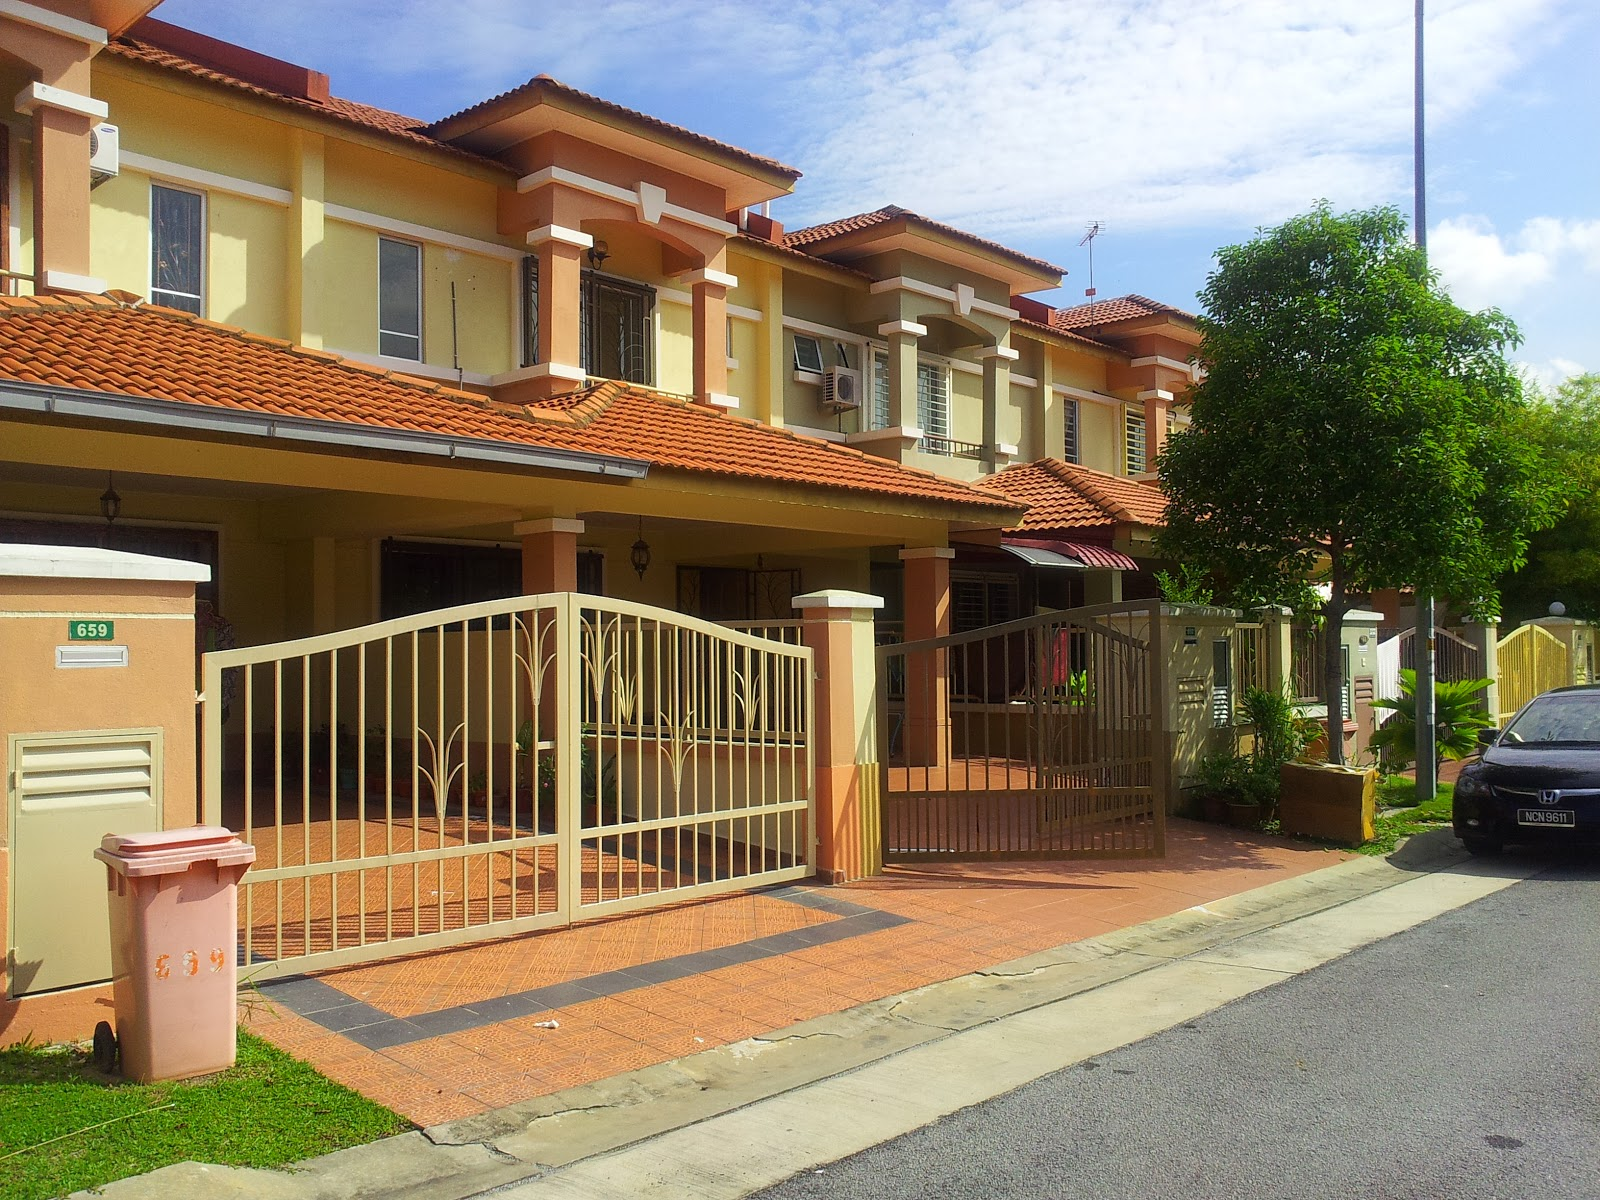 Rumah Untuk Di Jual Beli Dari Broker Hartanah Berdaftar Teres 2